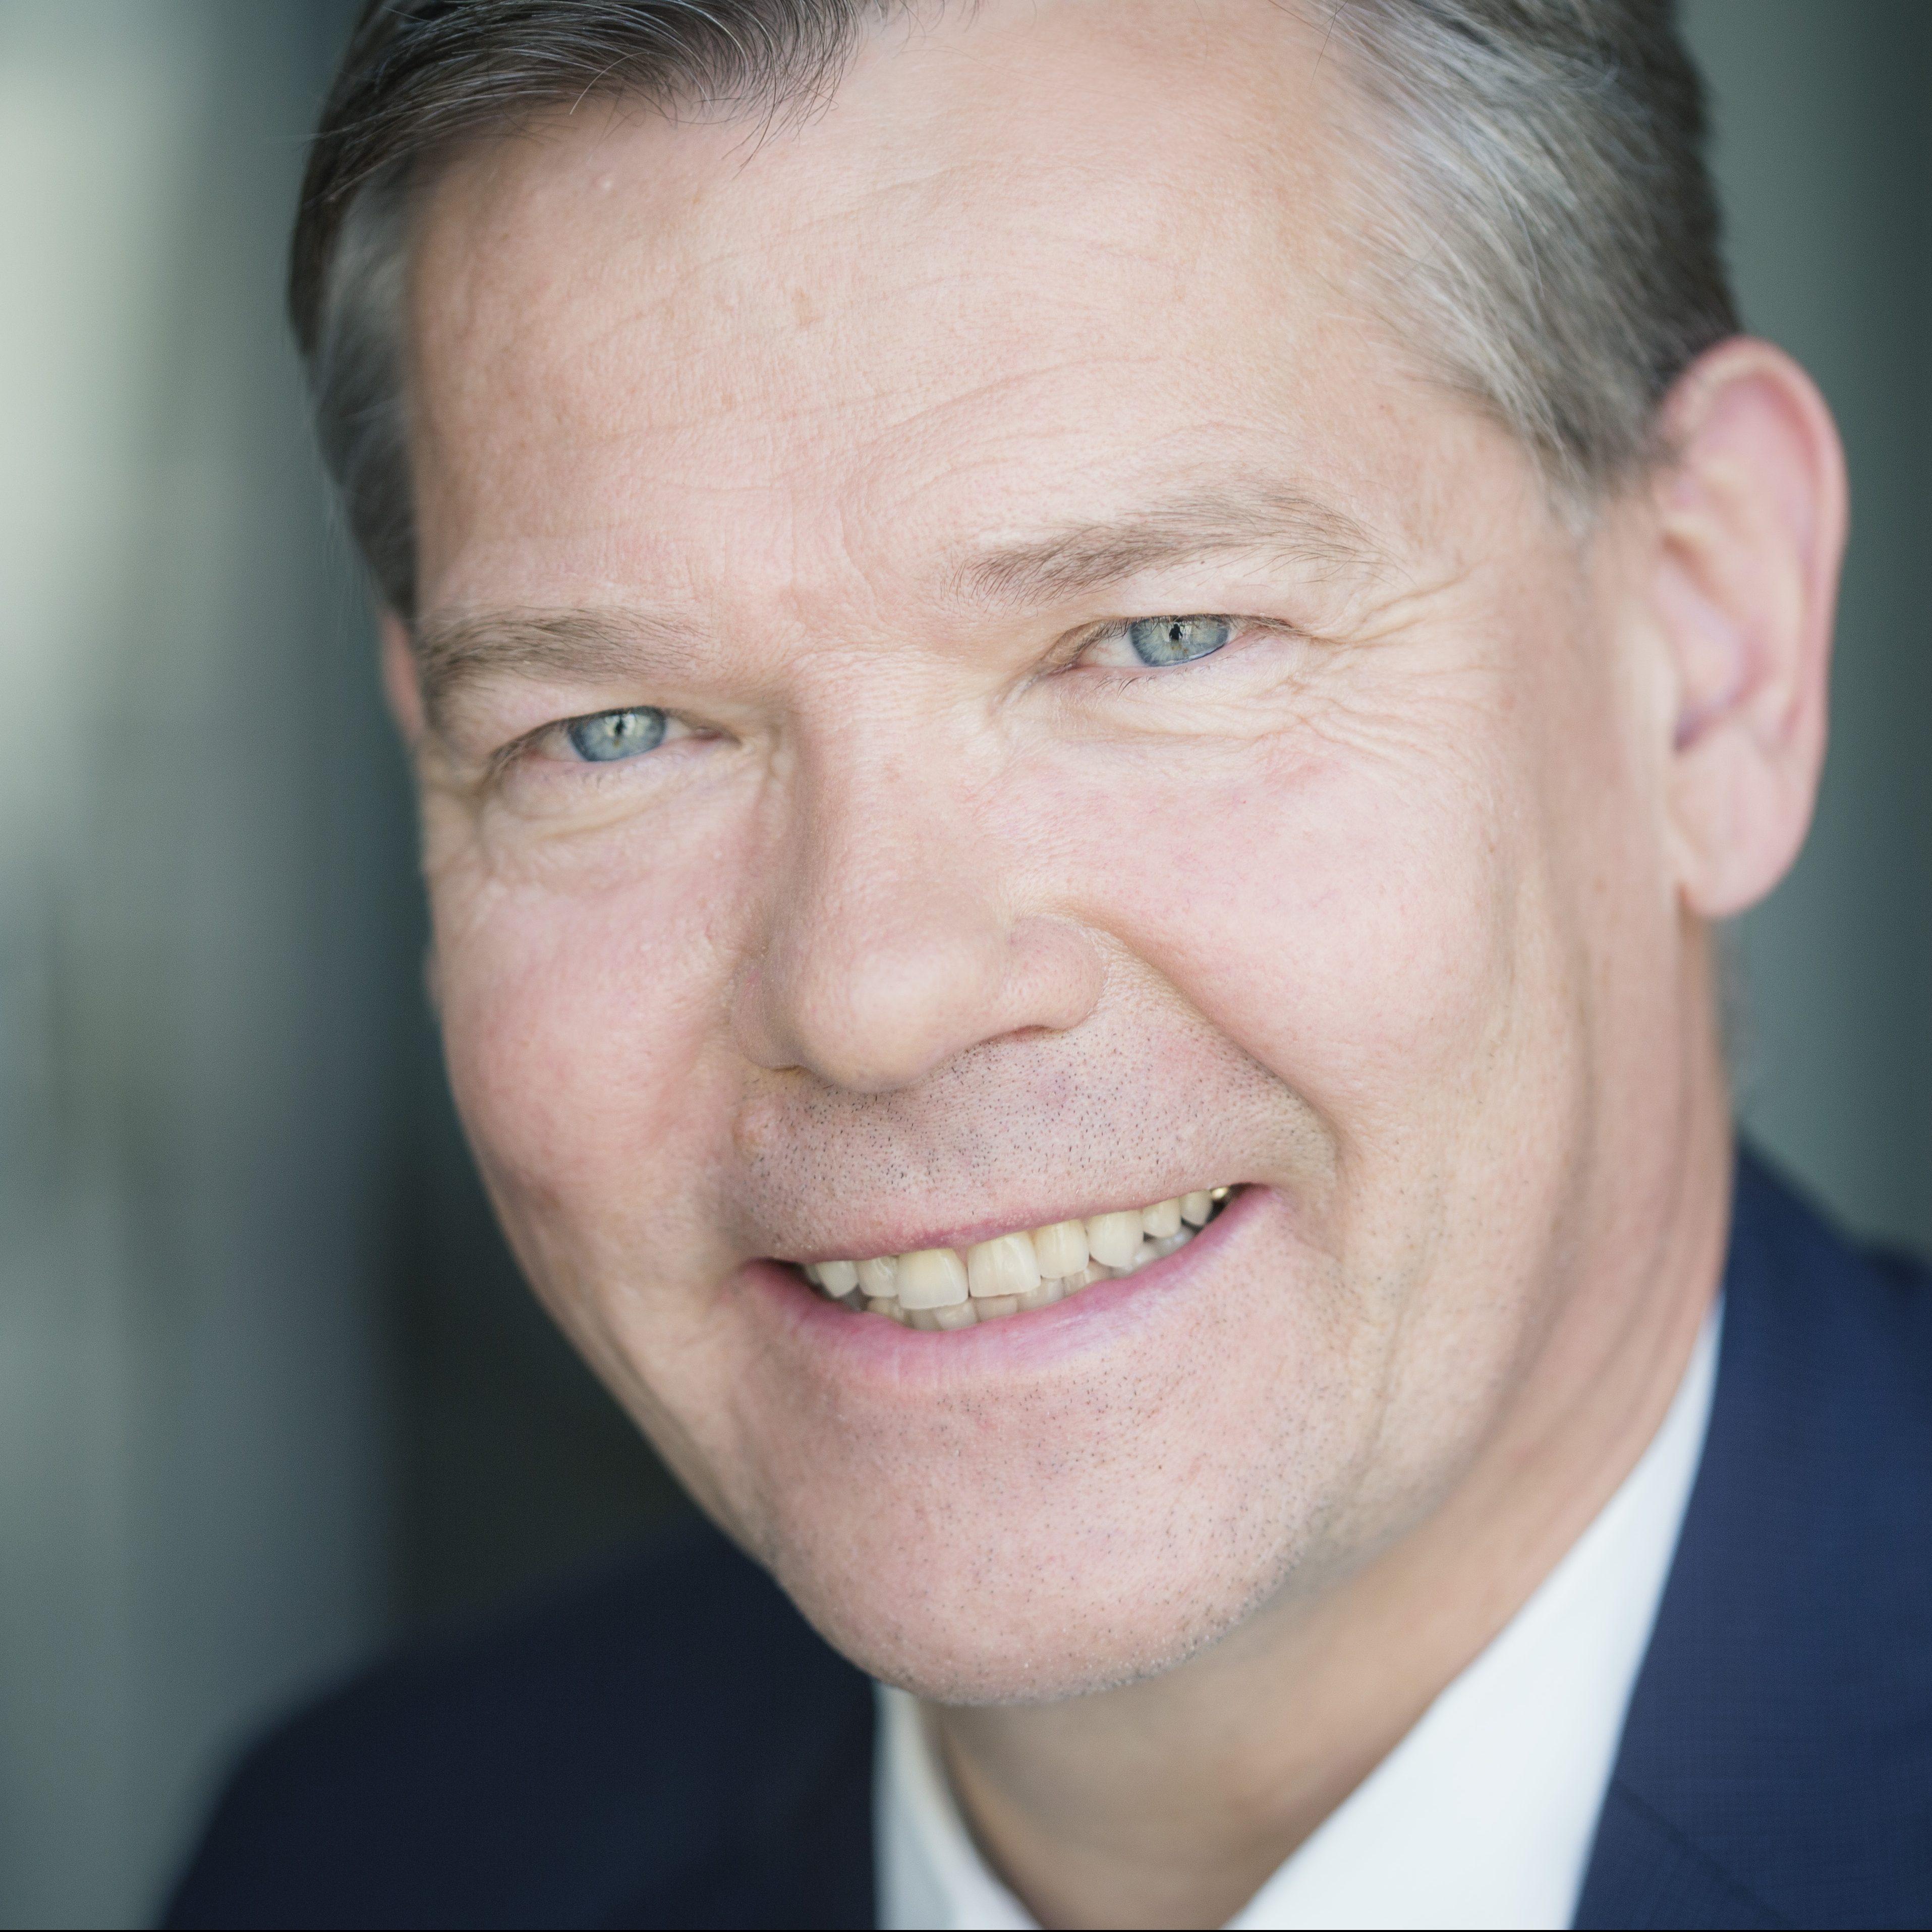 Dr. Christian de Wyl